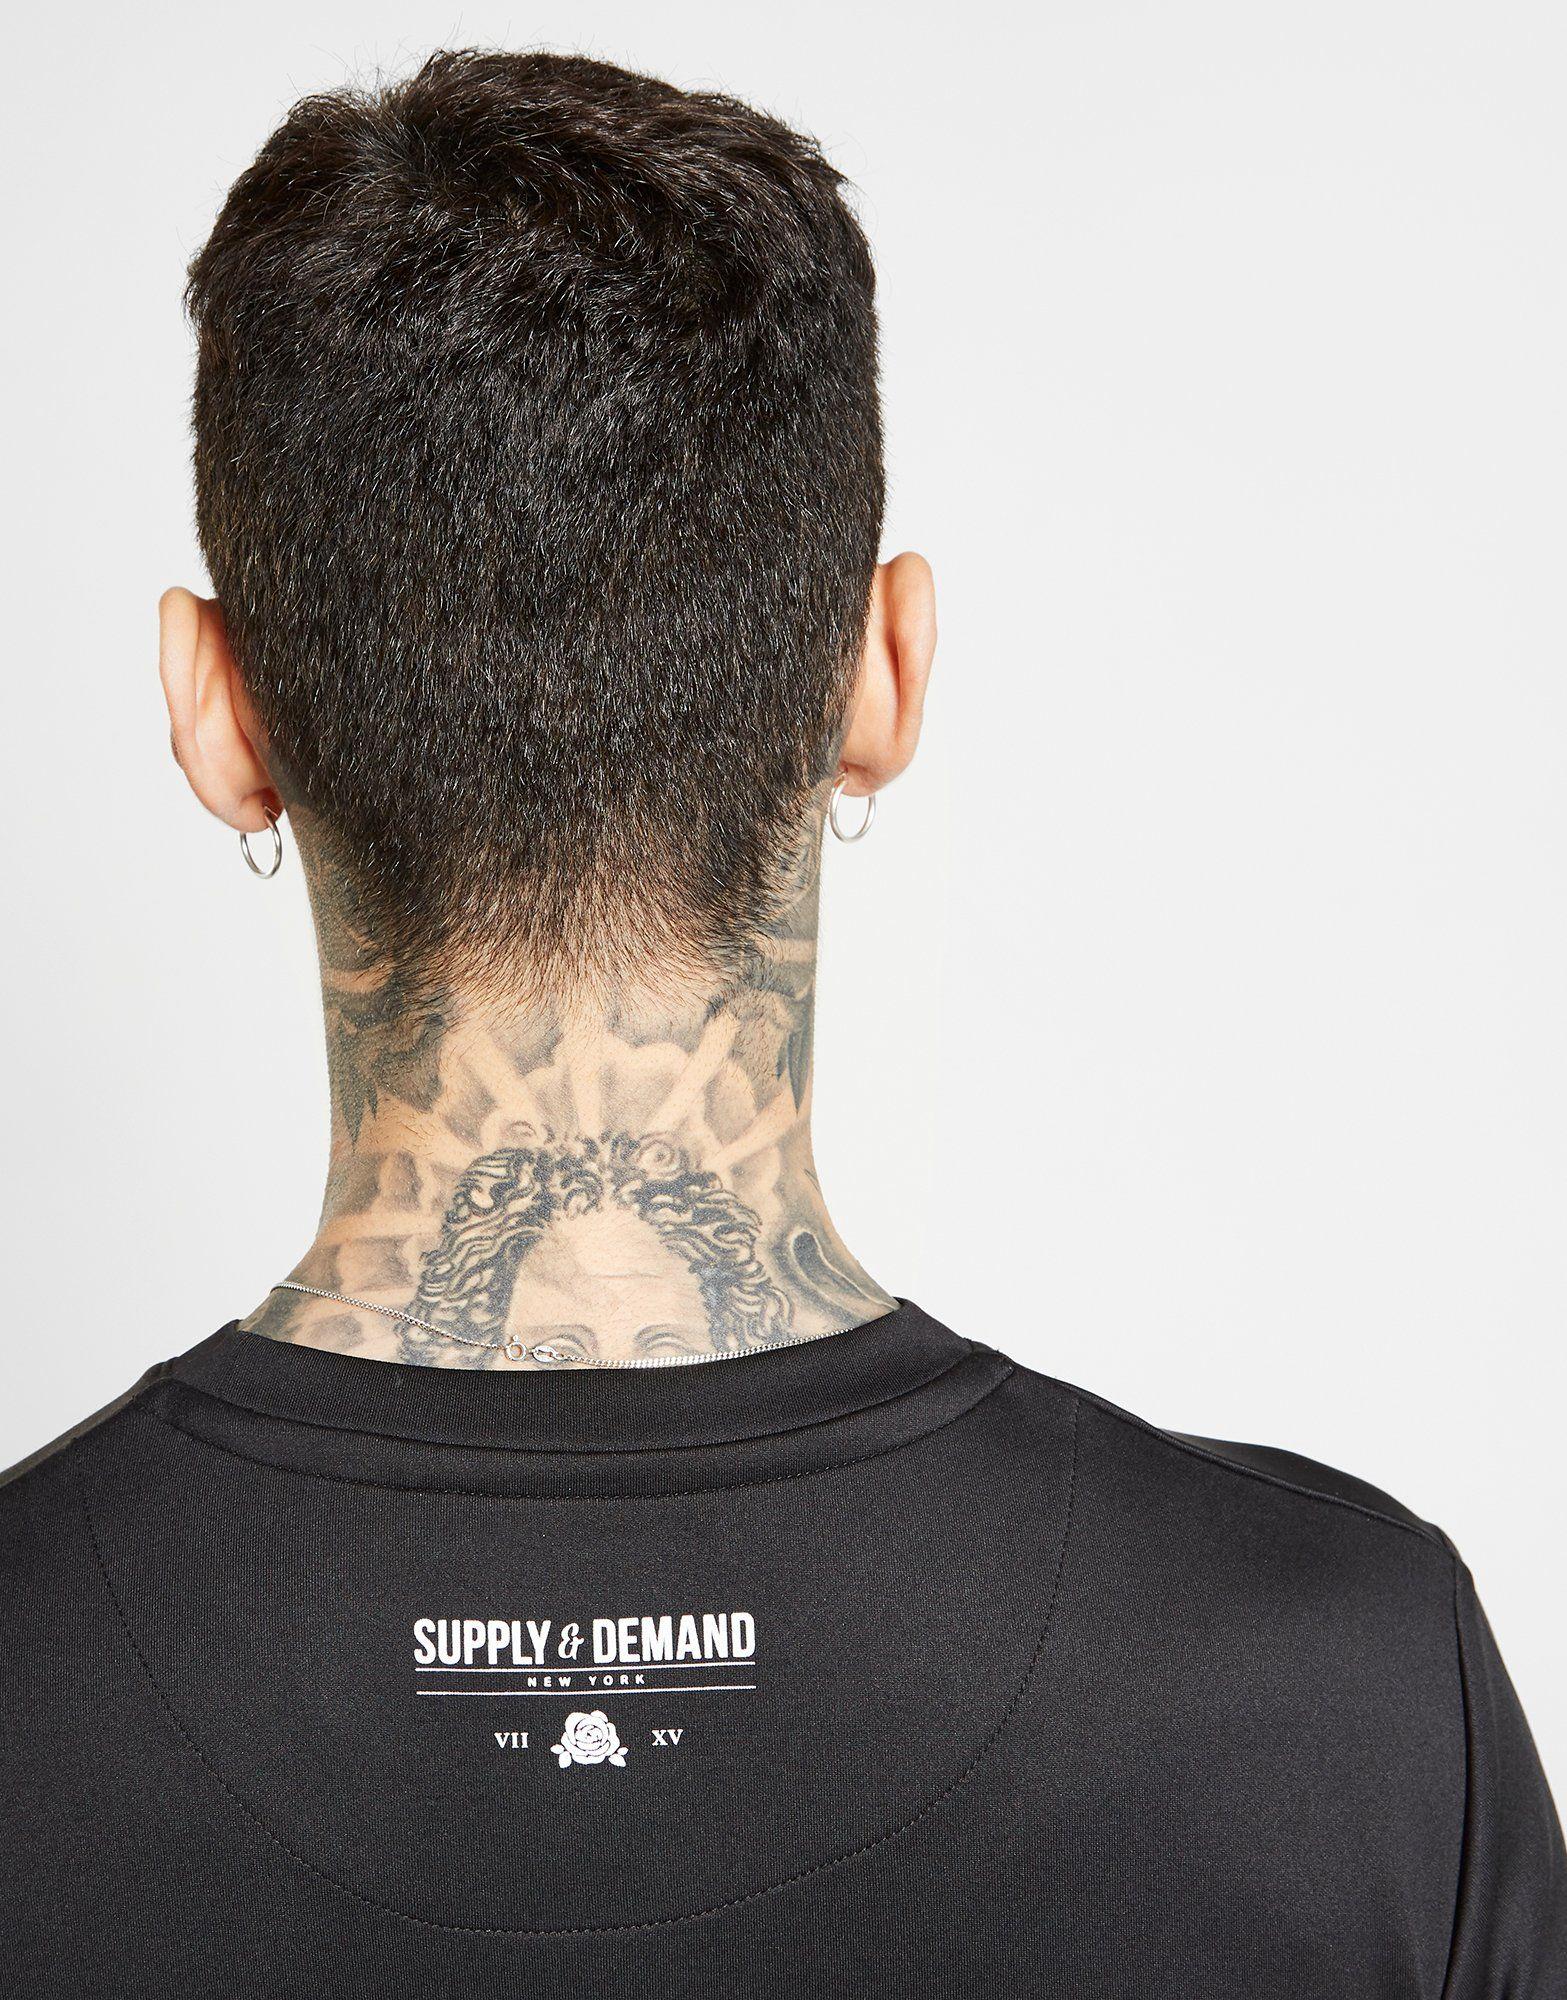 Supply & Demand Plush T-Shirt